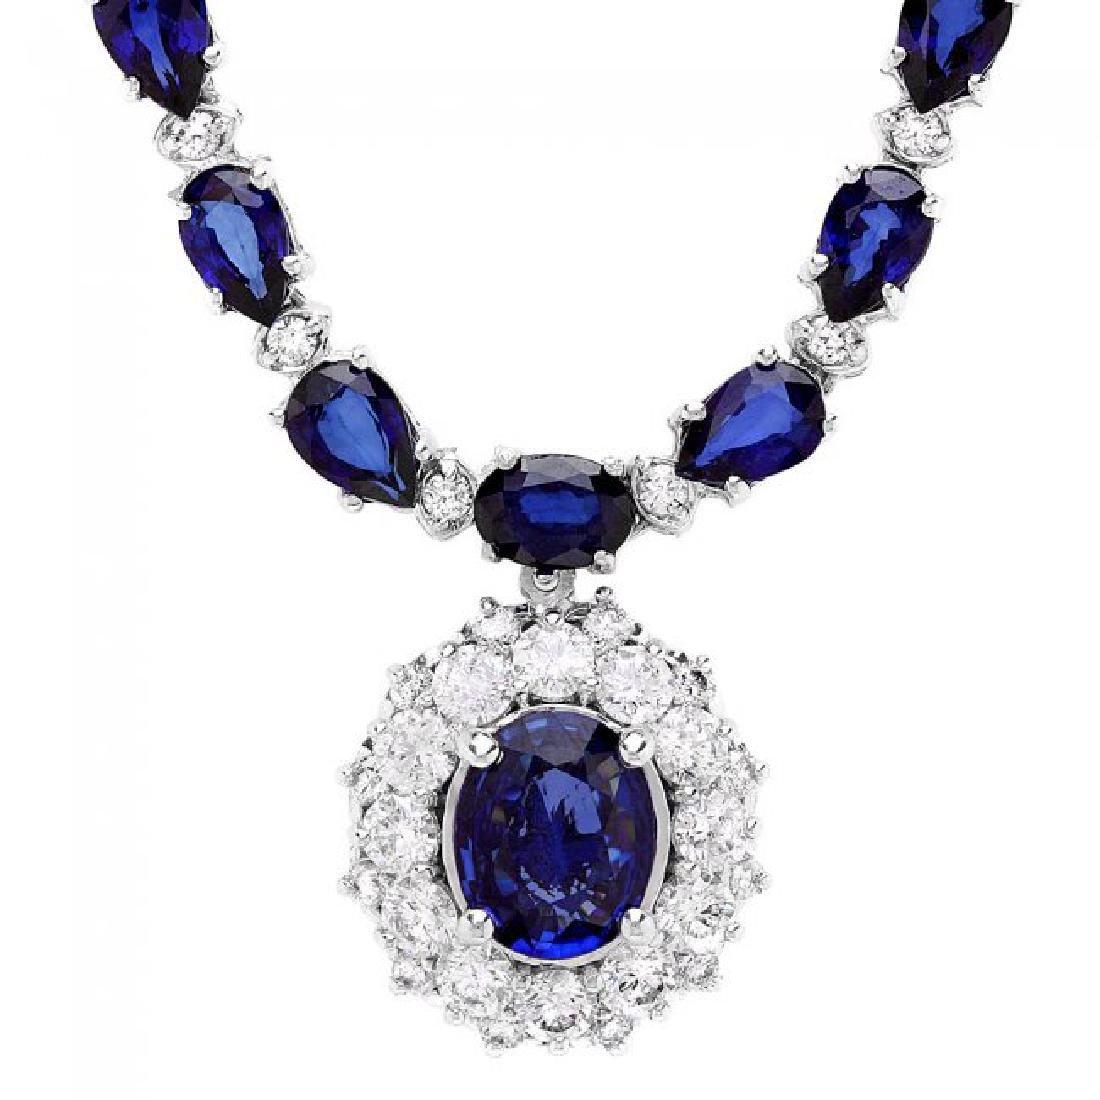 14k Gold 28ct Sapphire 3.35ct Diamond Necklace - 2